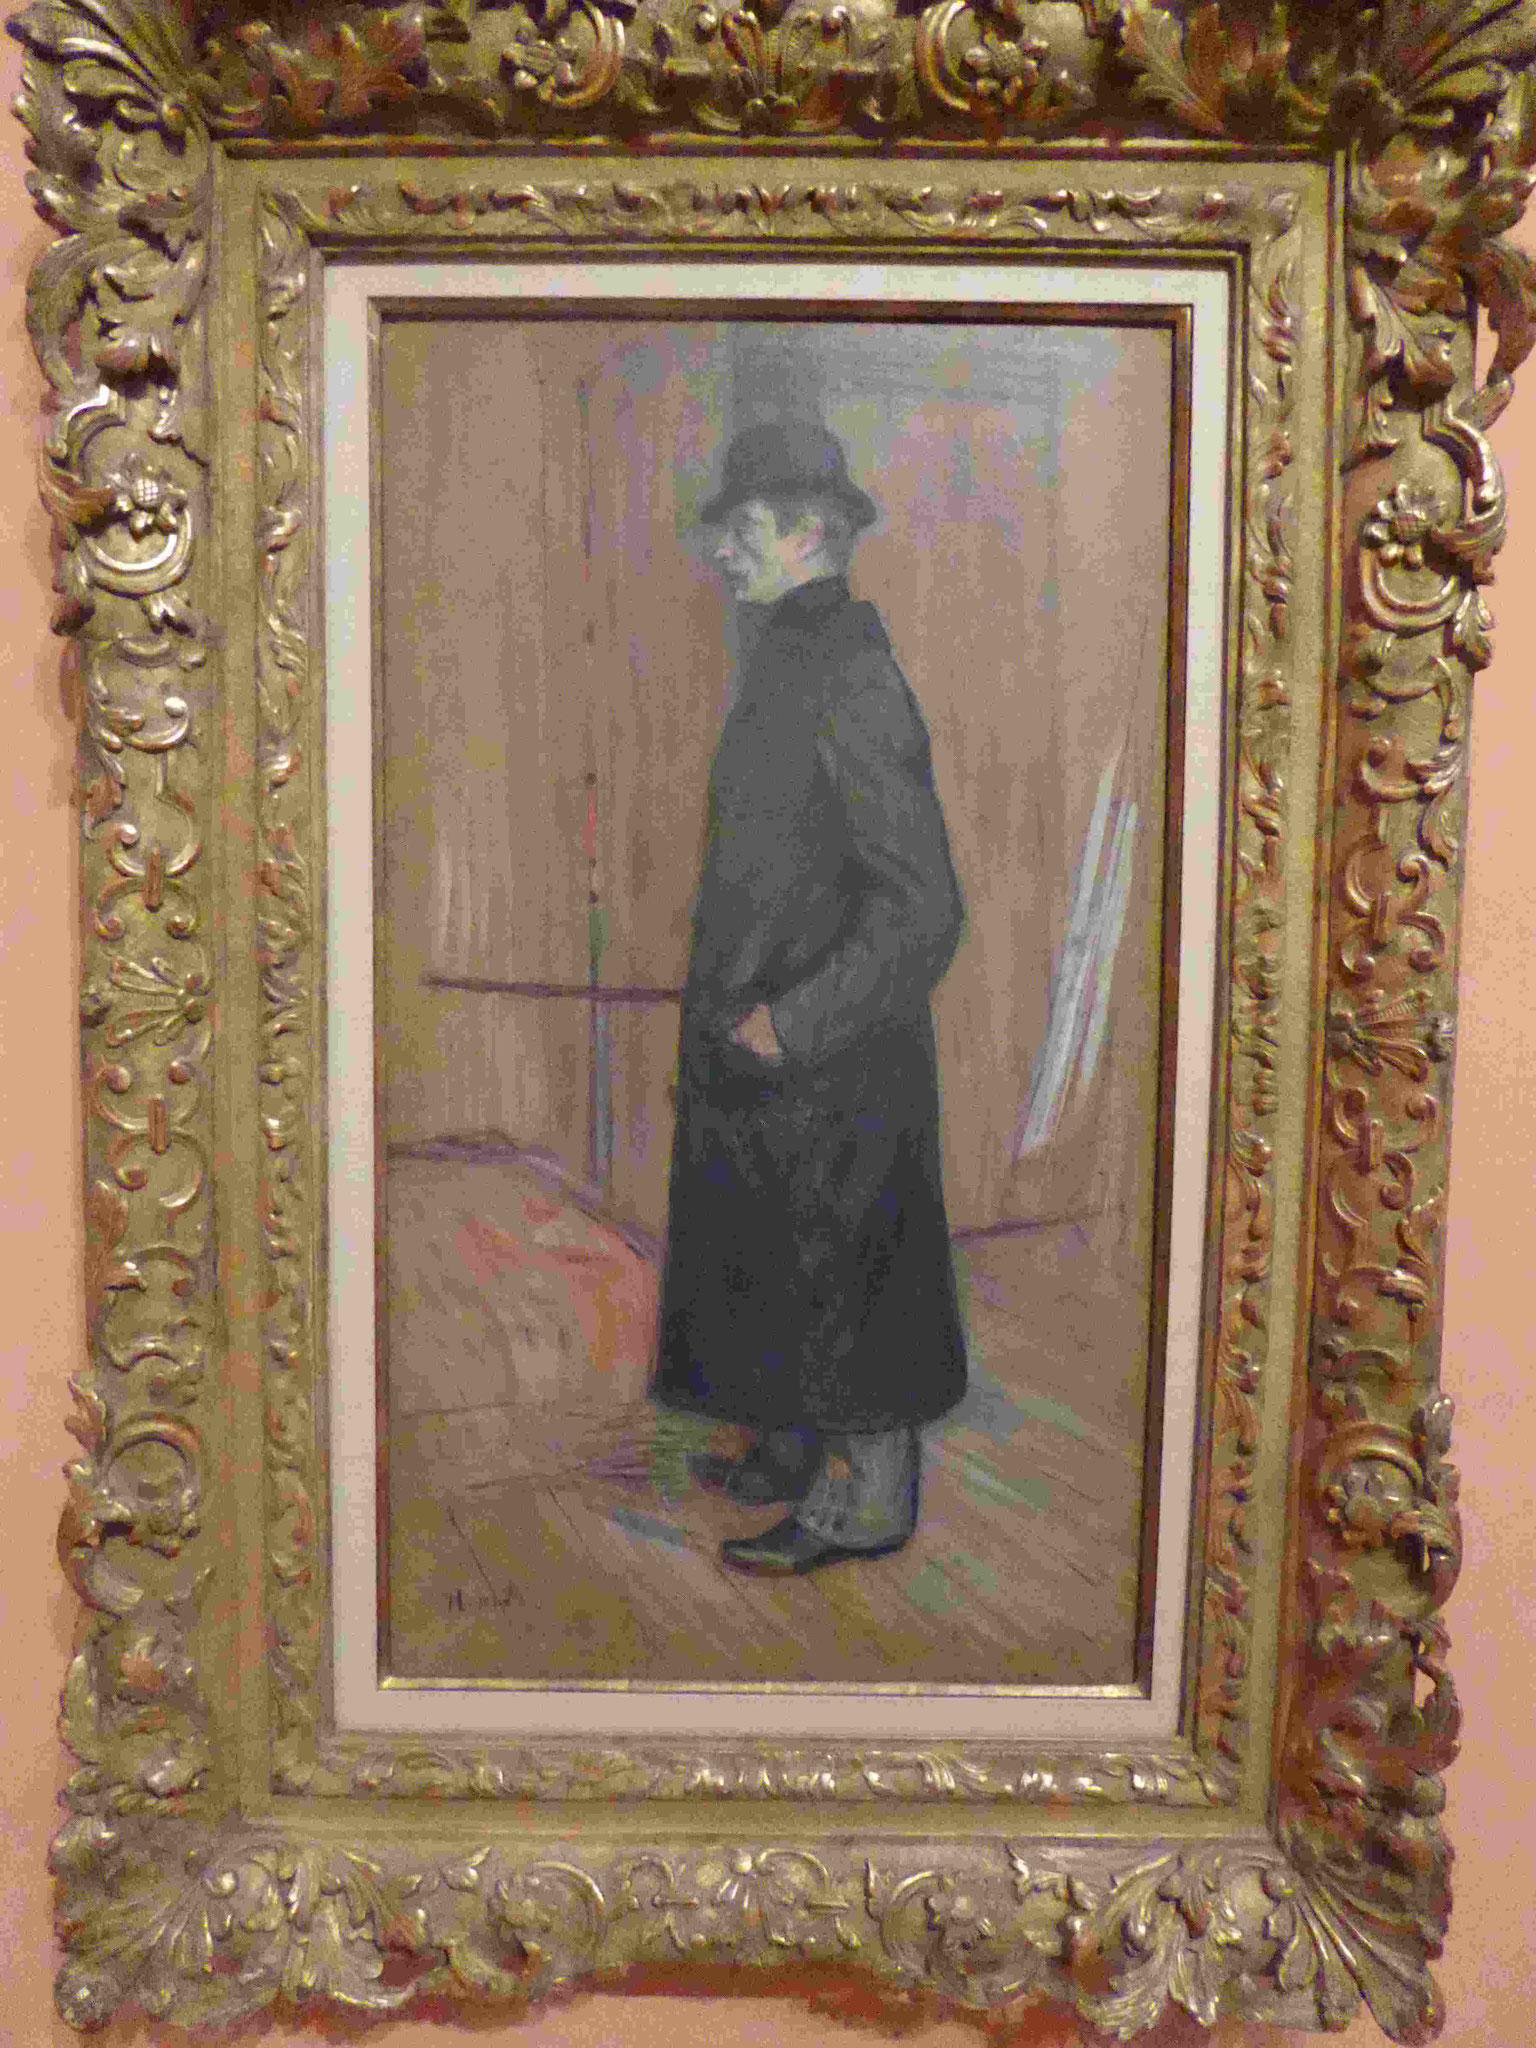 Henri Toulouse-Lautrec, Museo Thyssen-Bornemisza, Madrid, Spanien